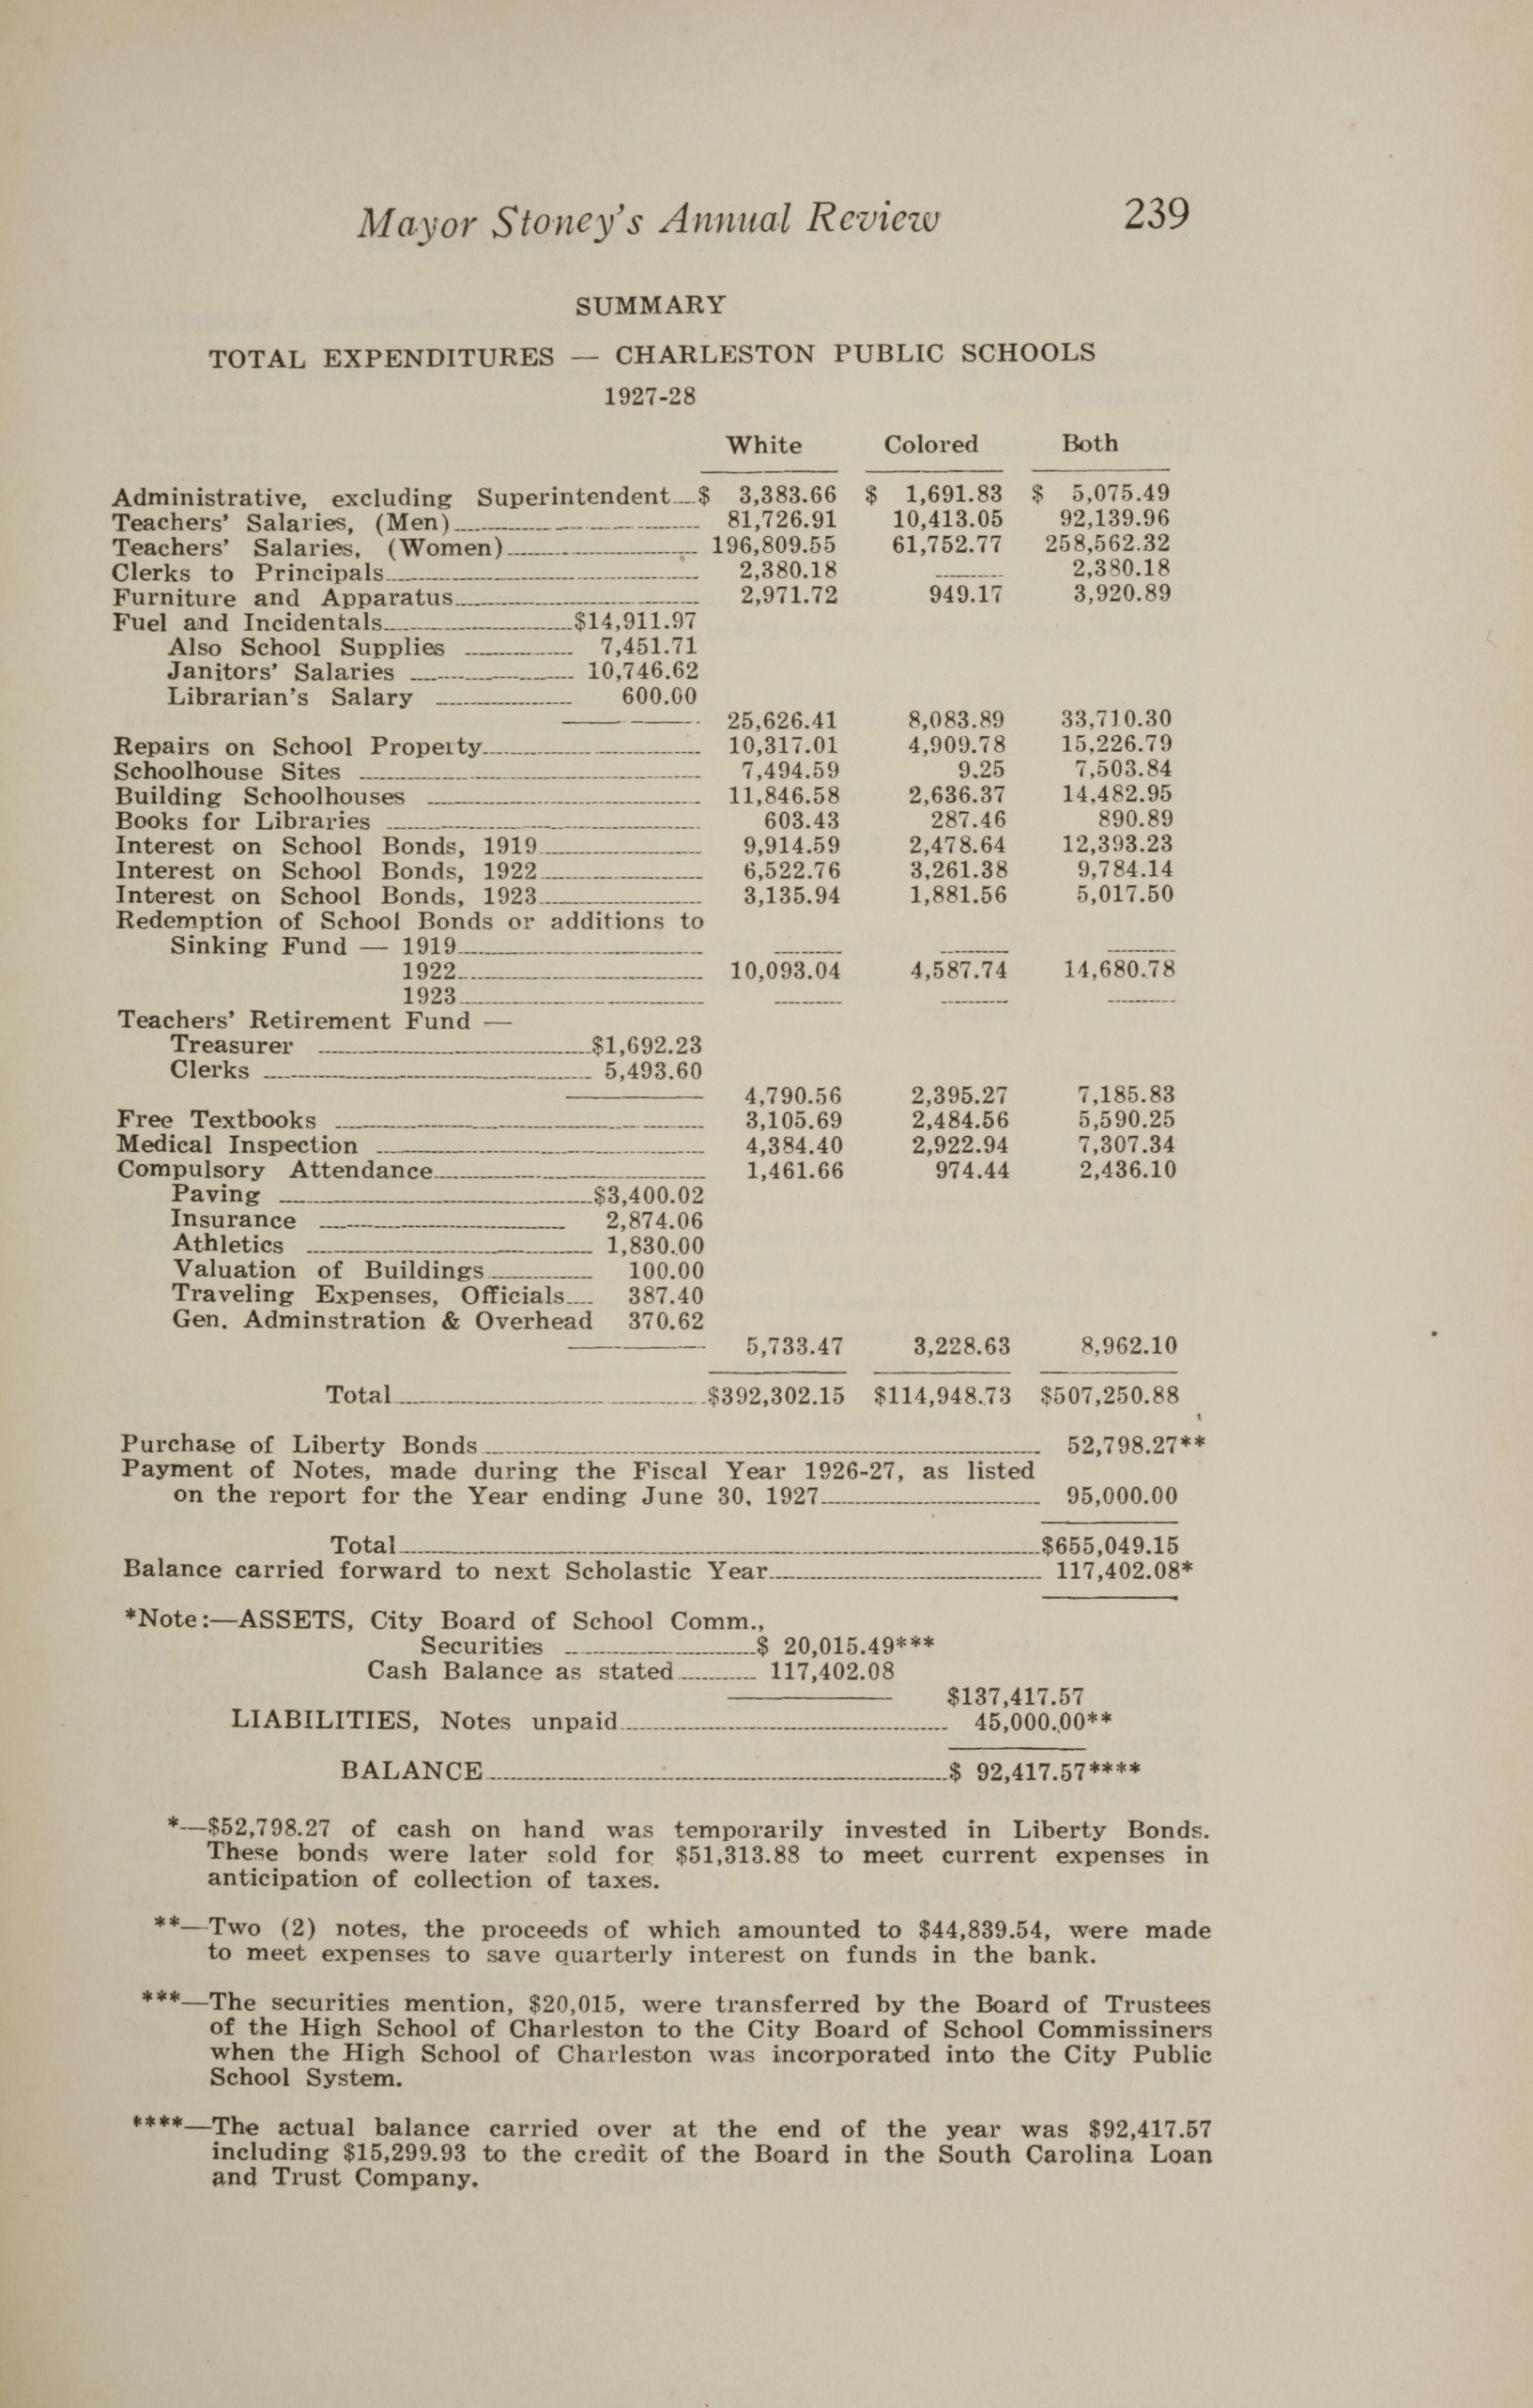 Charleston Yearbook, 1928, page 239